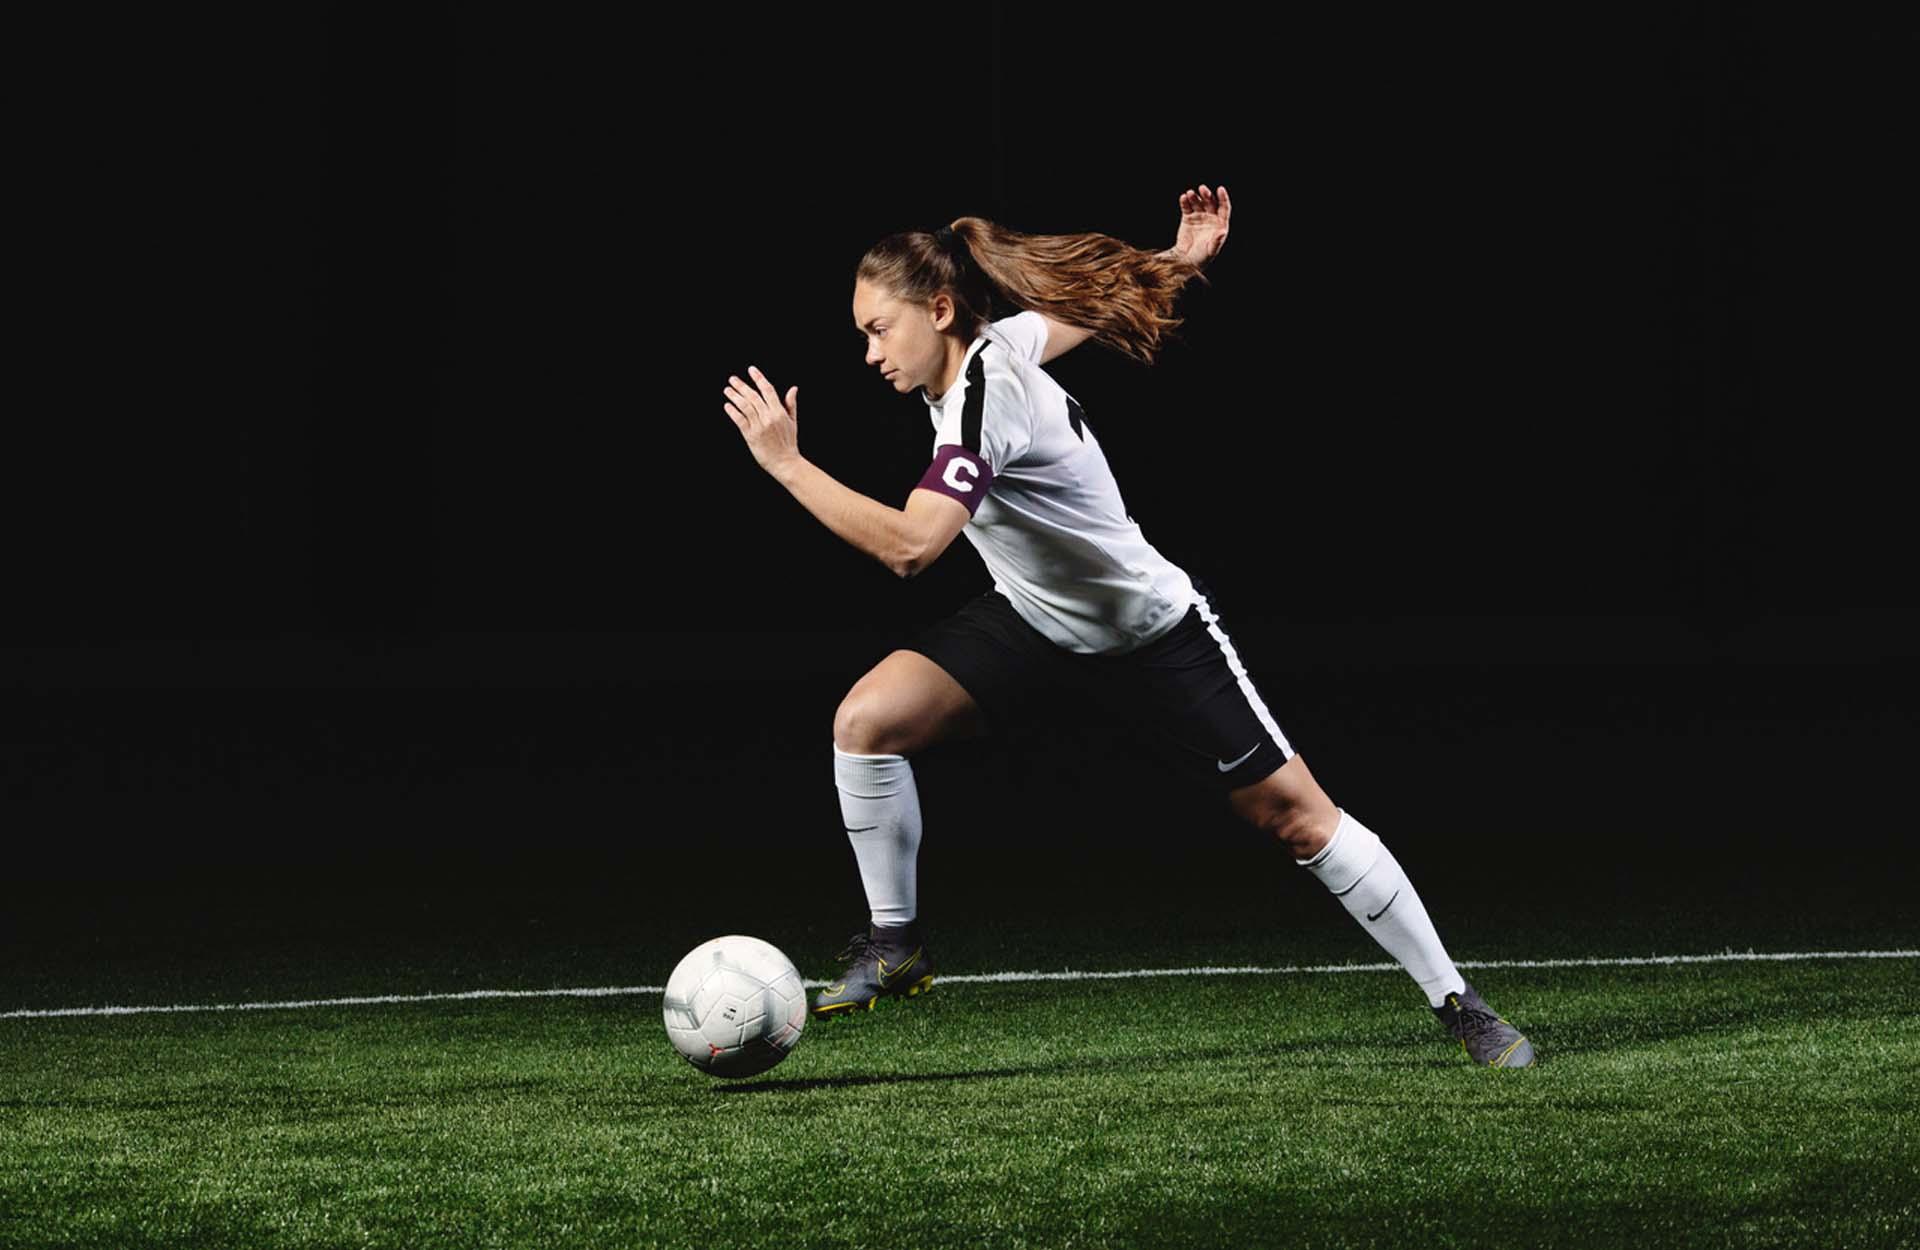 Before That, le football féminin soutenu par Nike